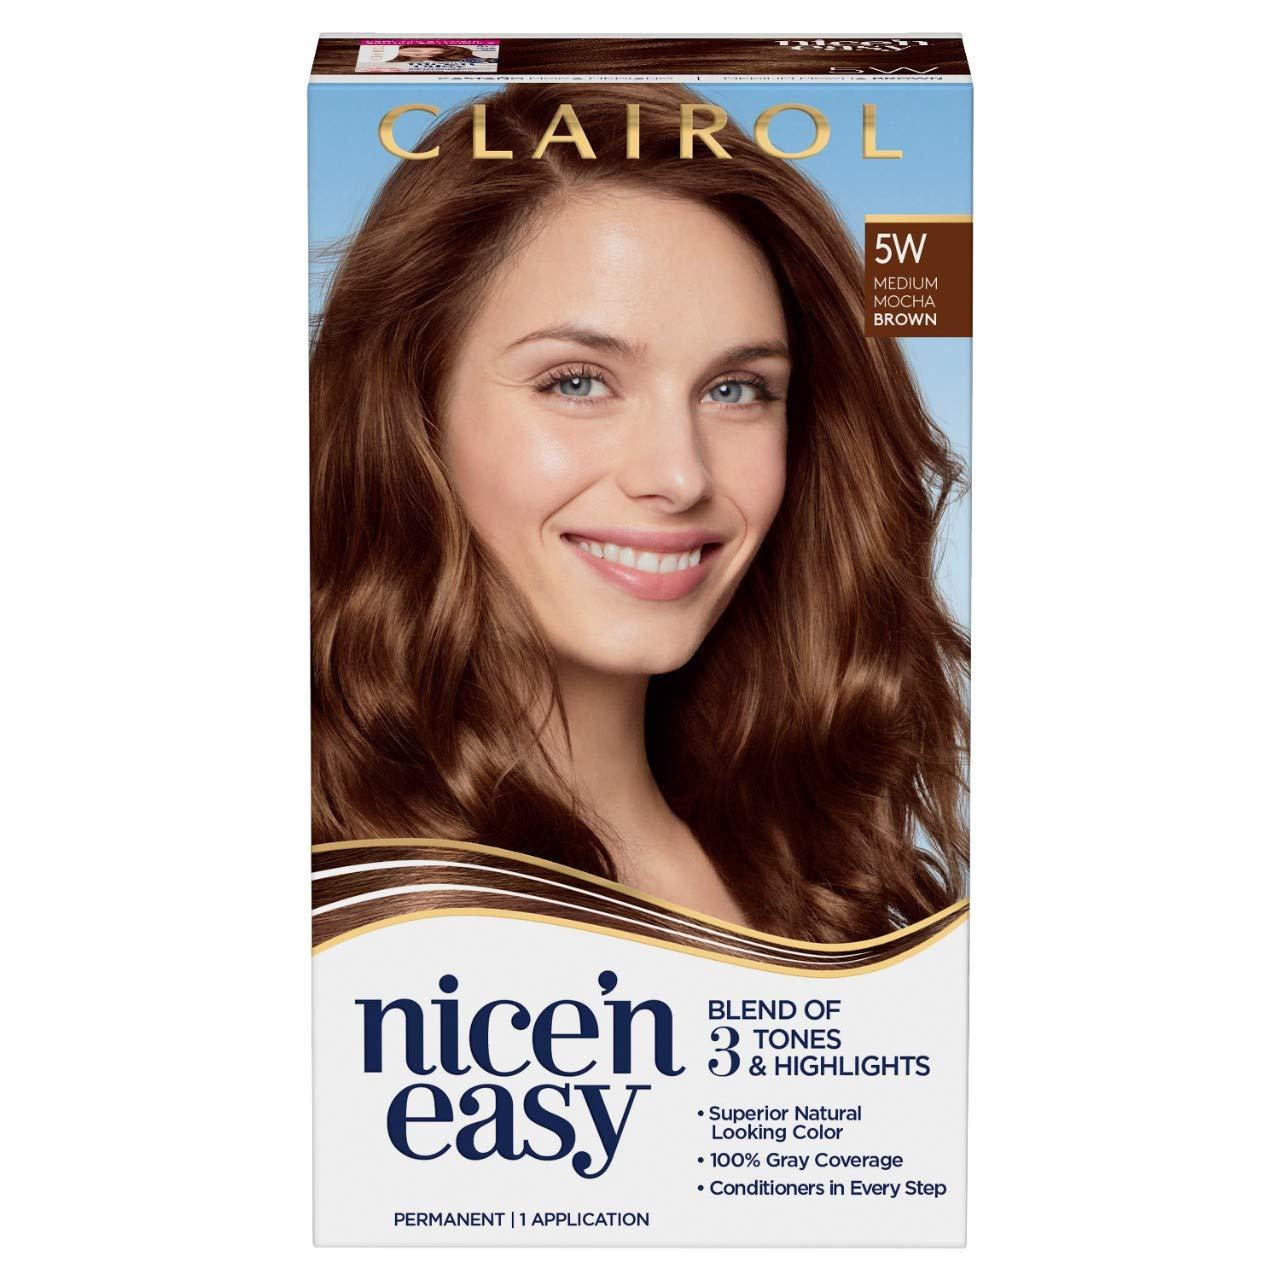 New color Clairol Nice'n Easy Permanent Hair Gifts Dye Mocha Brown 5W Ha Medium